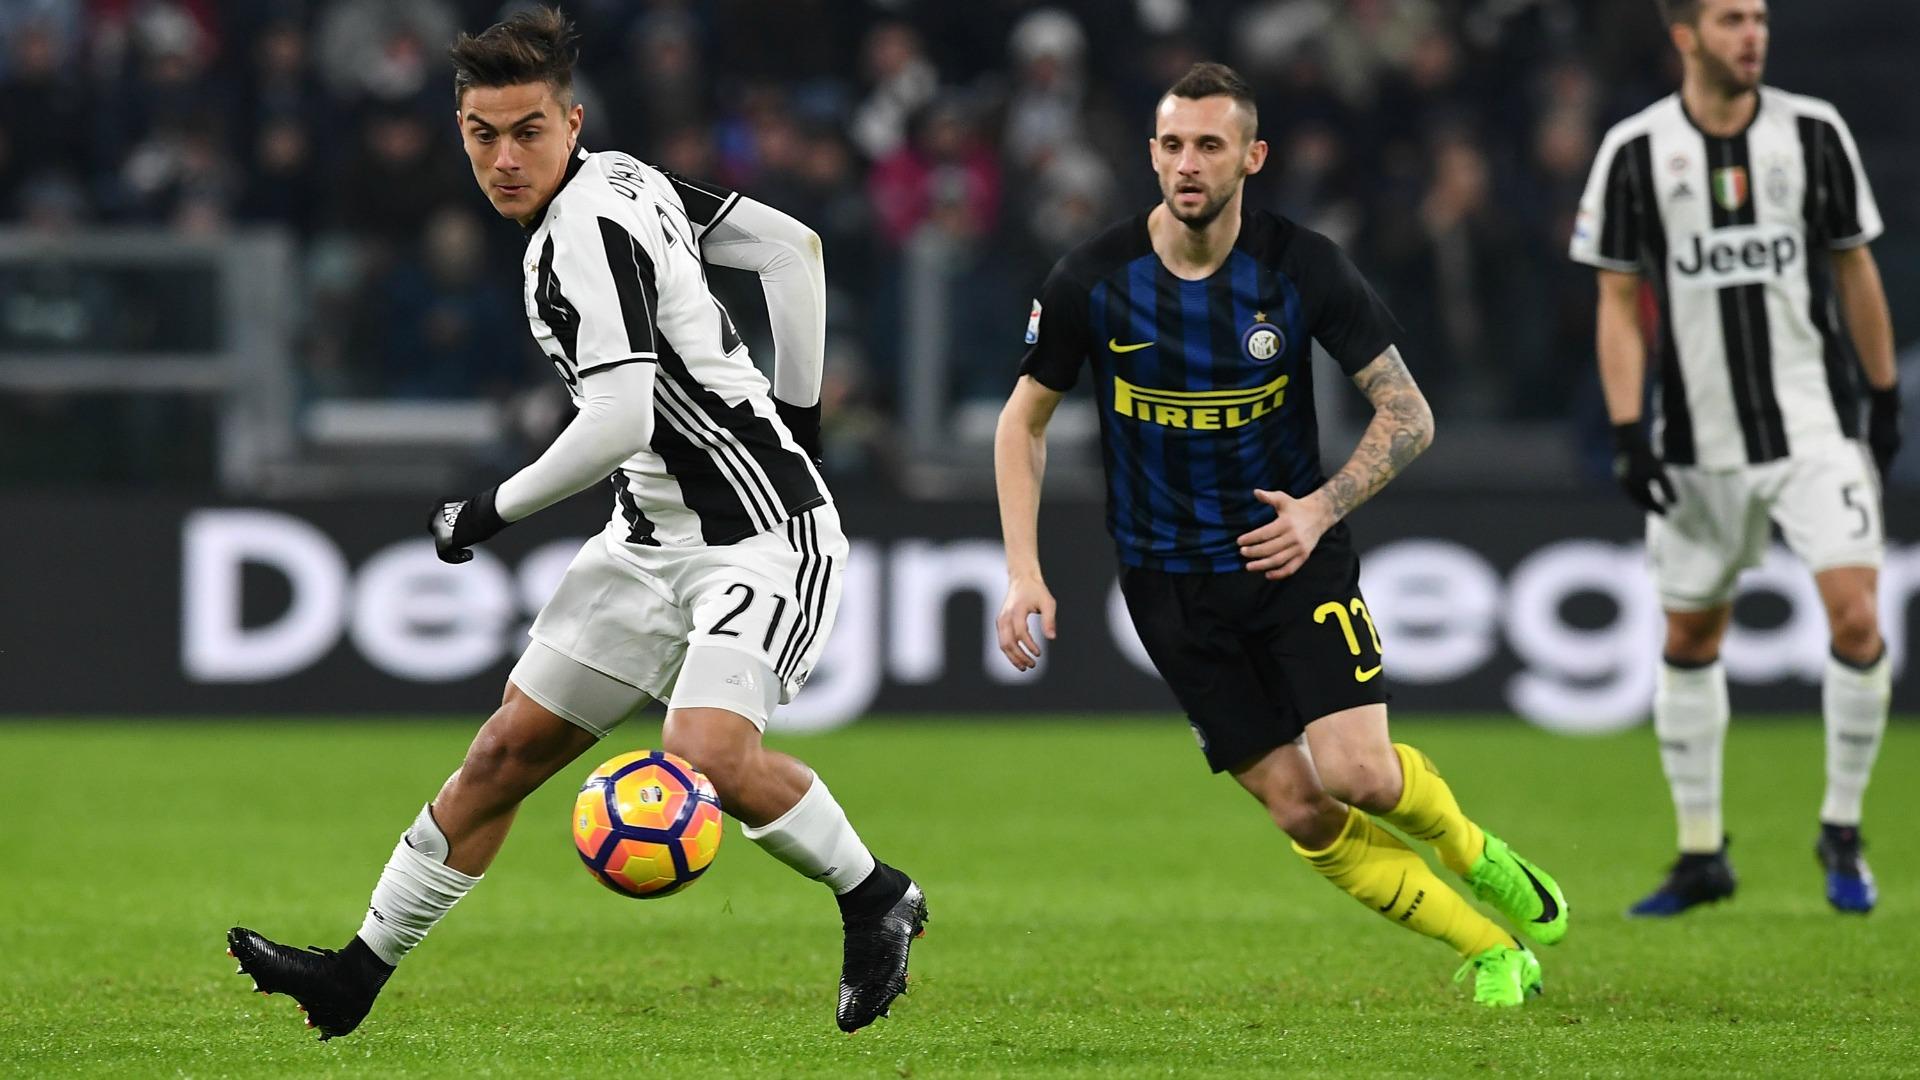 Paulo Dybala Marcelo Brozovic Juventus Inter